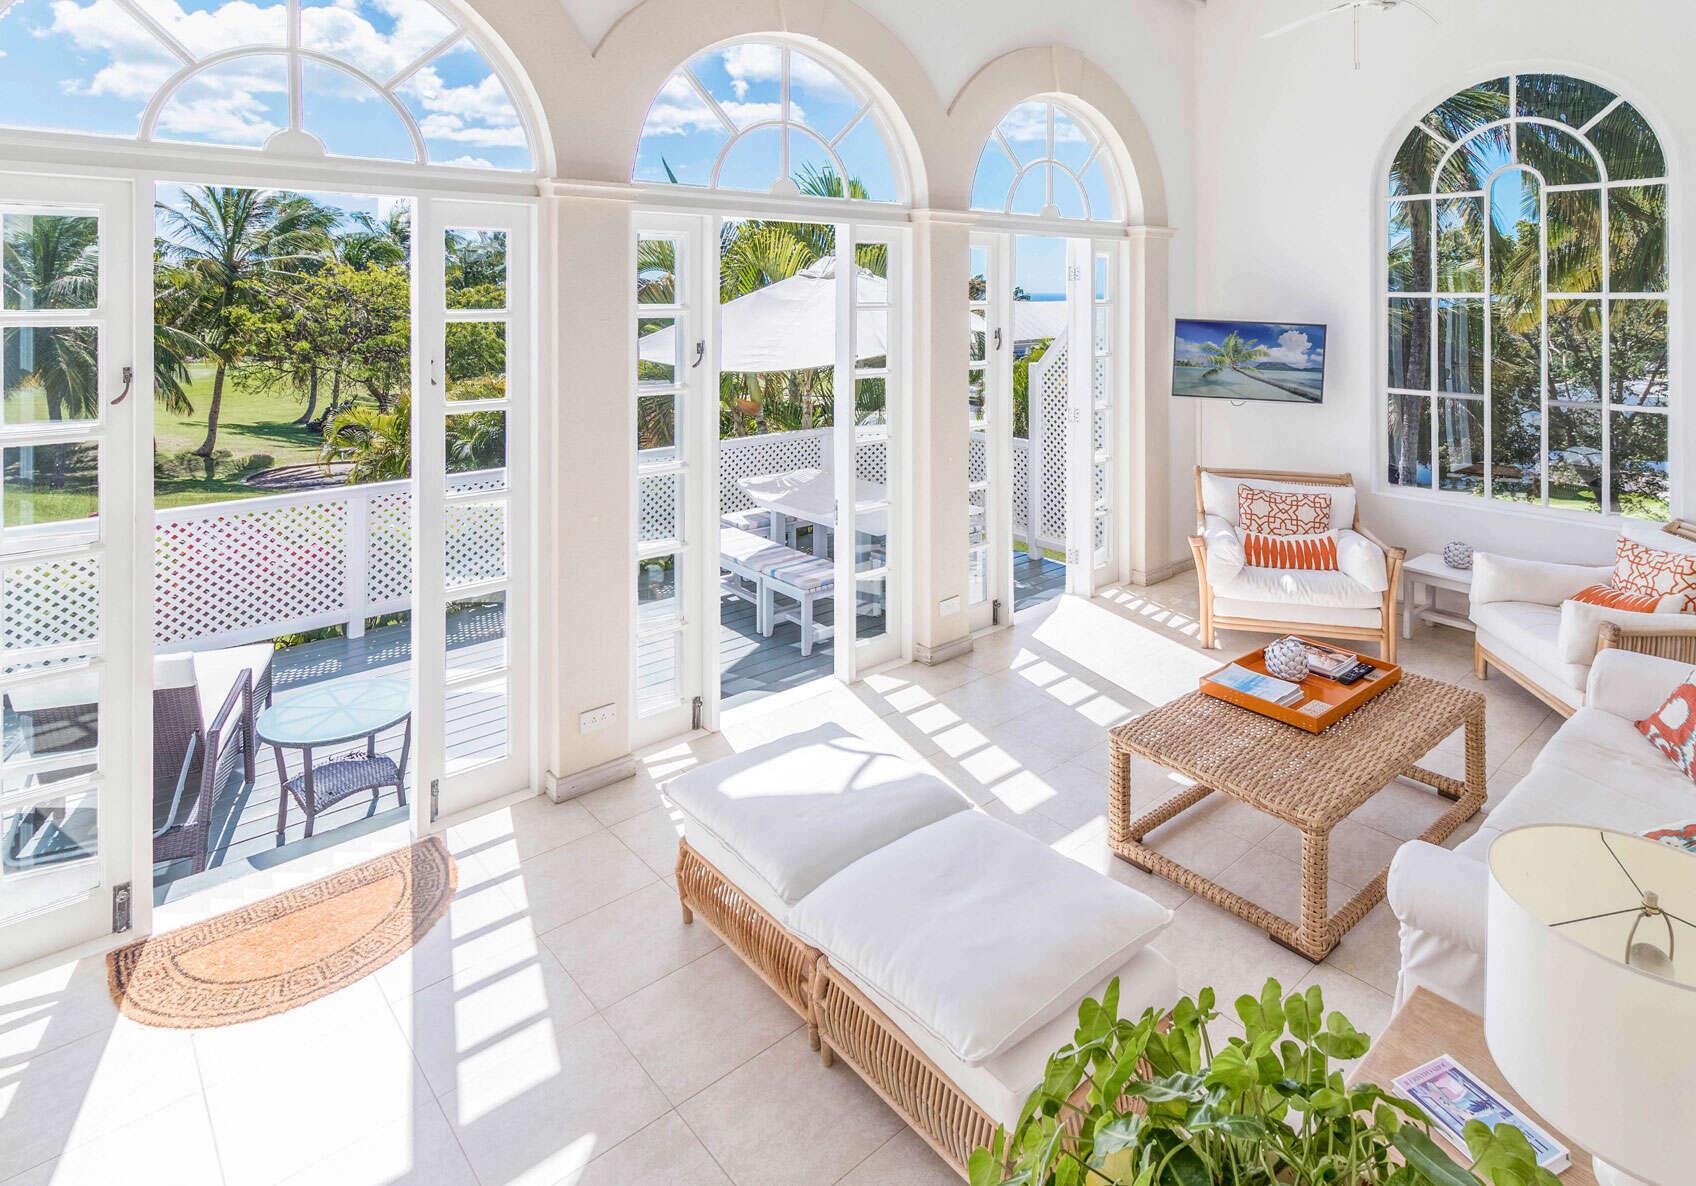 Luxury villa rentals caribbean - Barbados - St james - Royal westmoreland golf resort - Cassia Heights 24 - Image 1/15